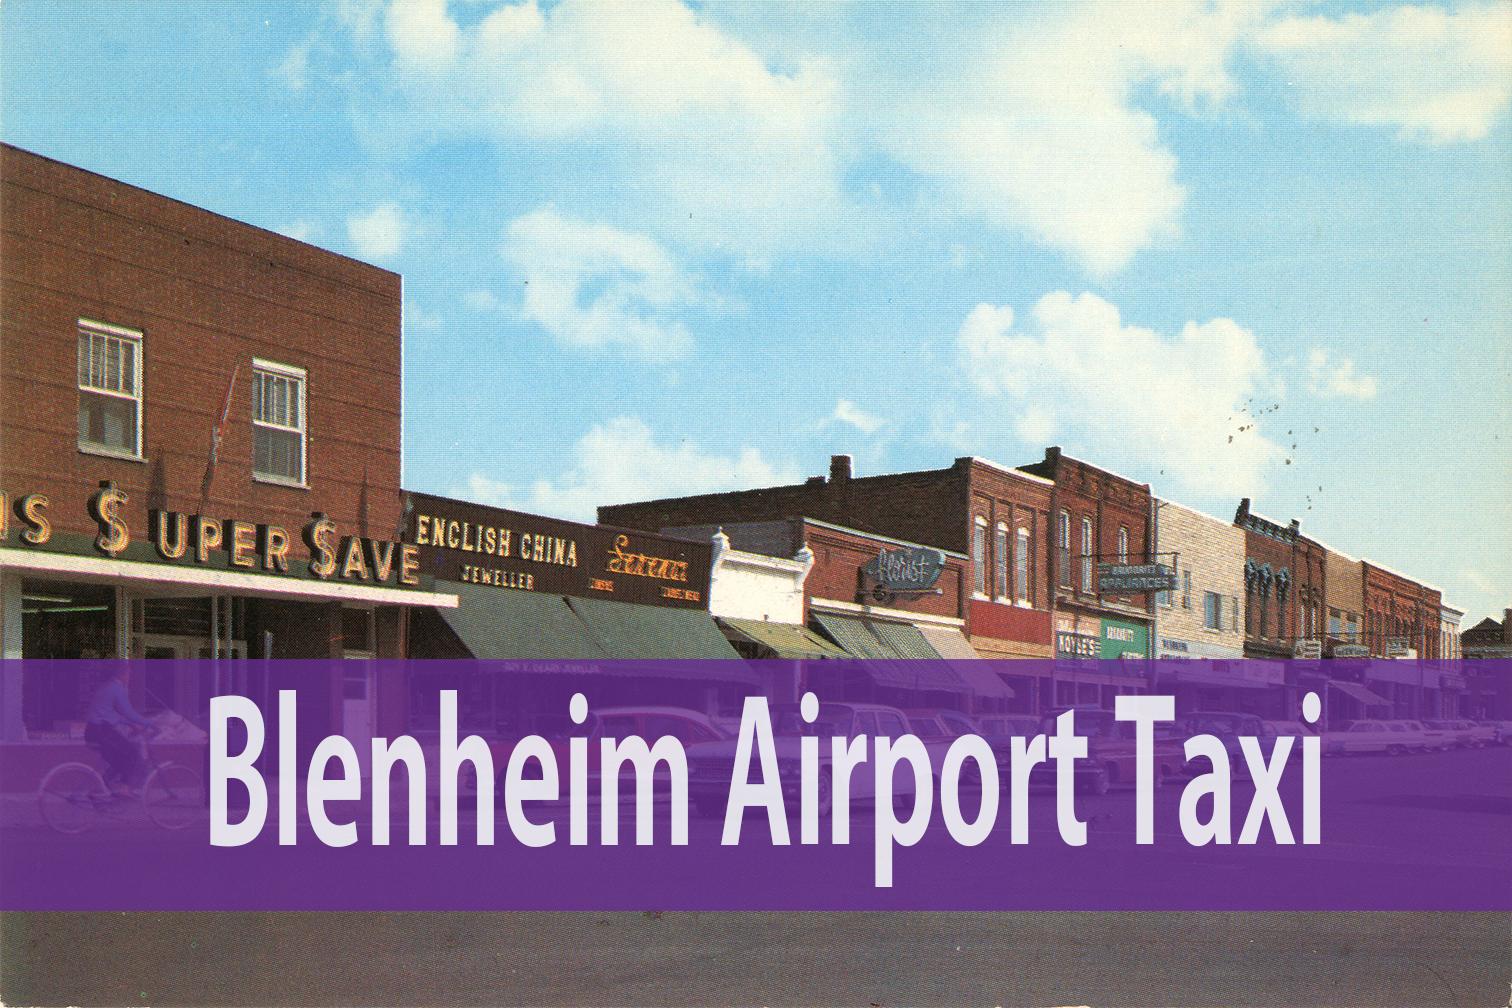 Blenheim Airport Taxi